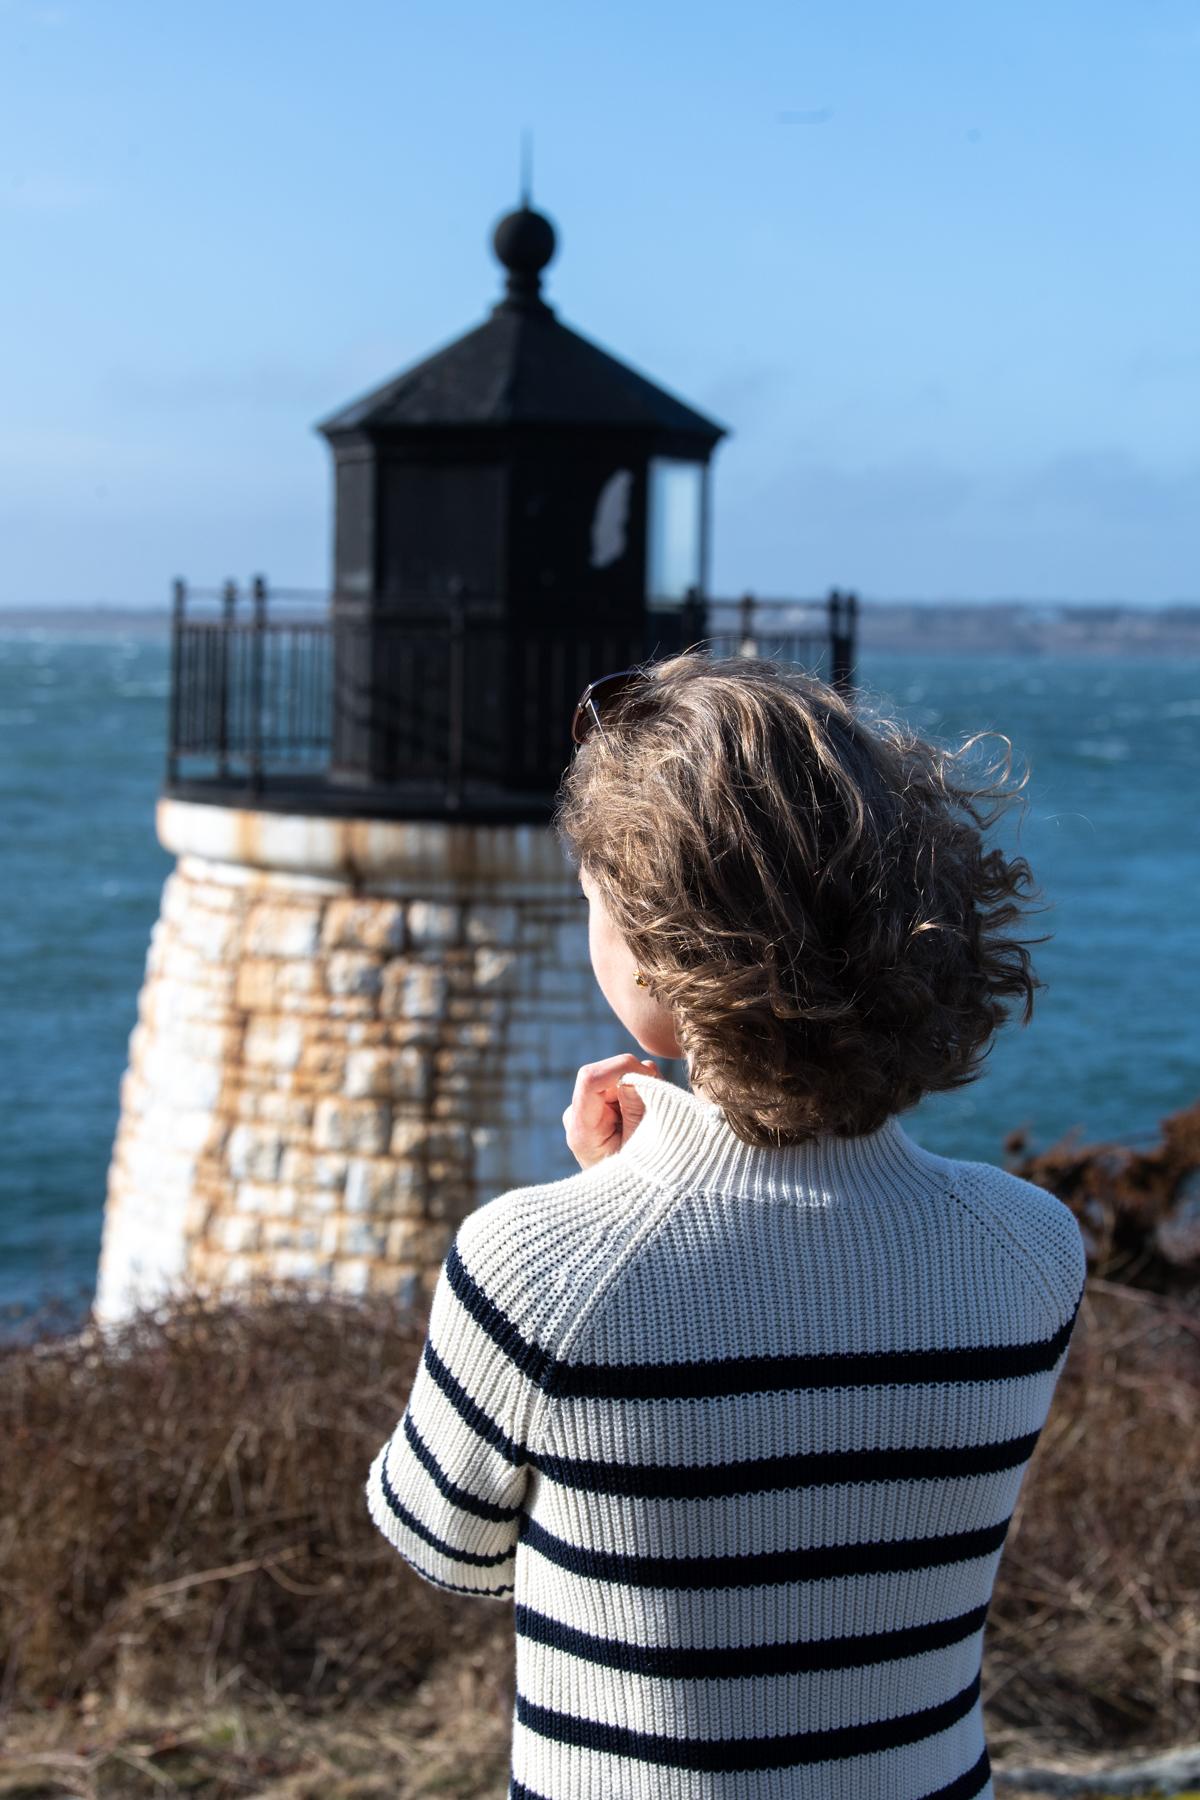 Newport%2C Rhode Island Weekend Travel Guide x Stacie Flinner-29.jpg